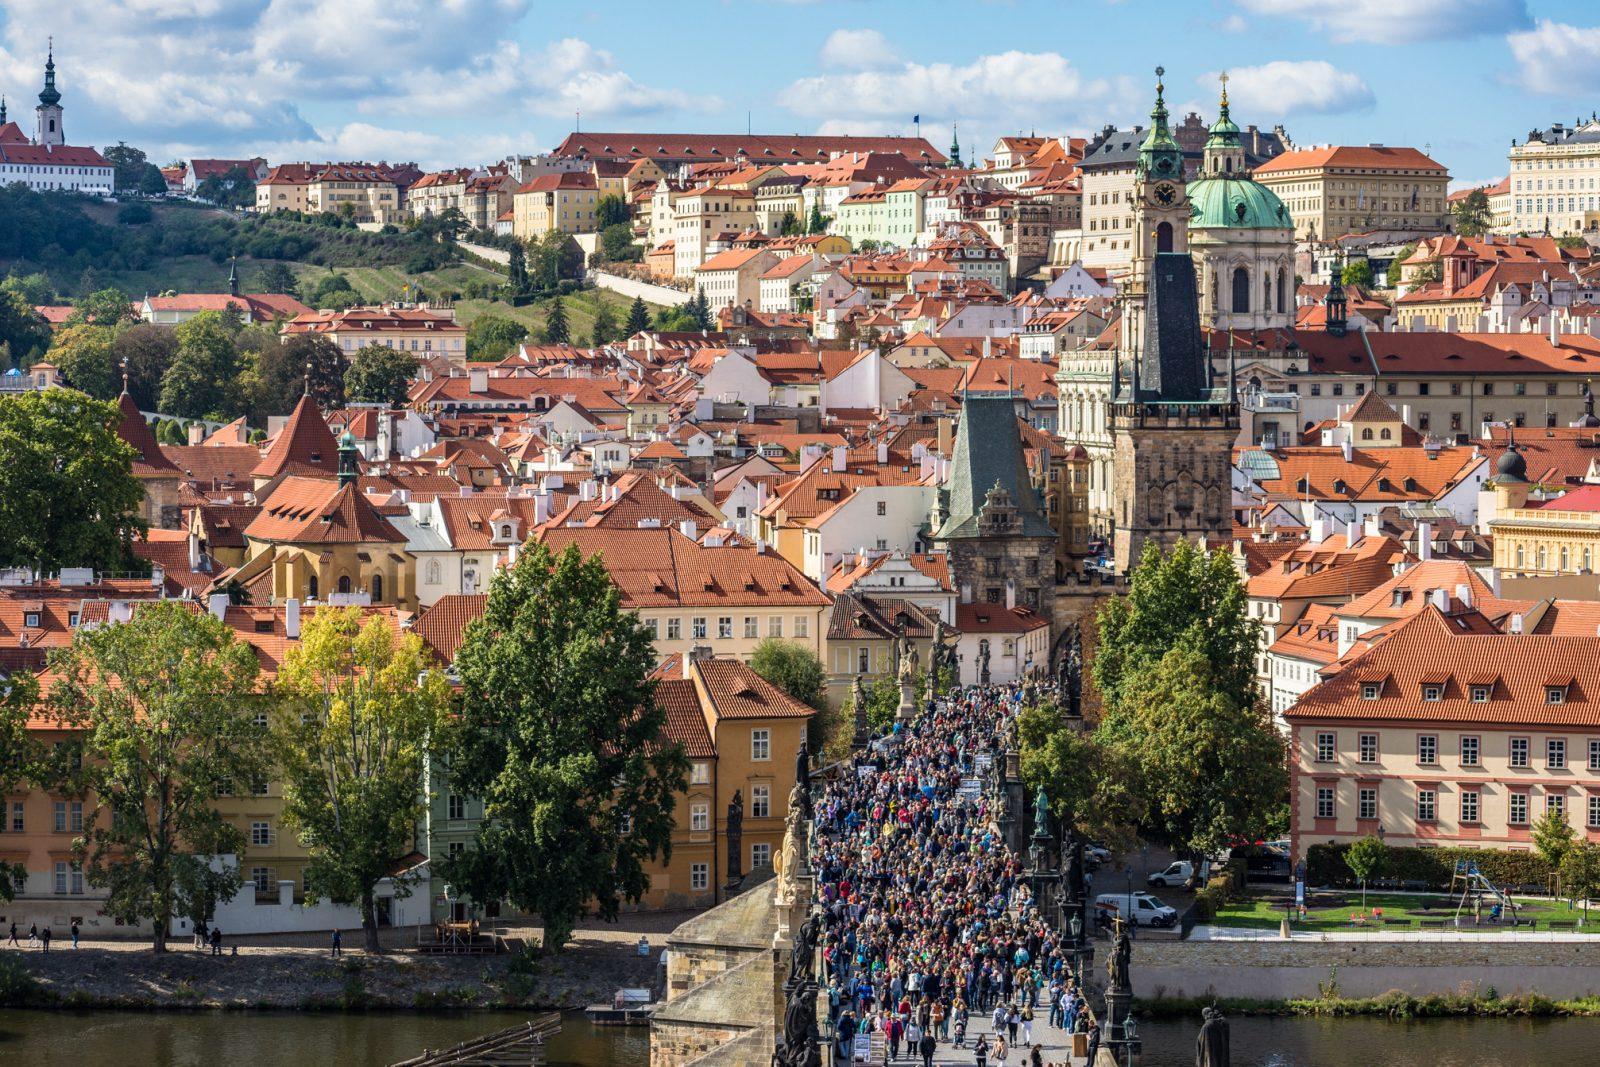 A guide to Prague's Mala Strana - Lesser Town